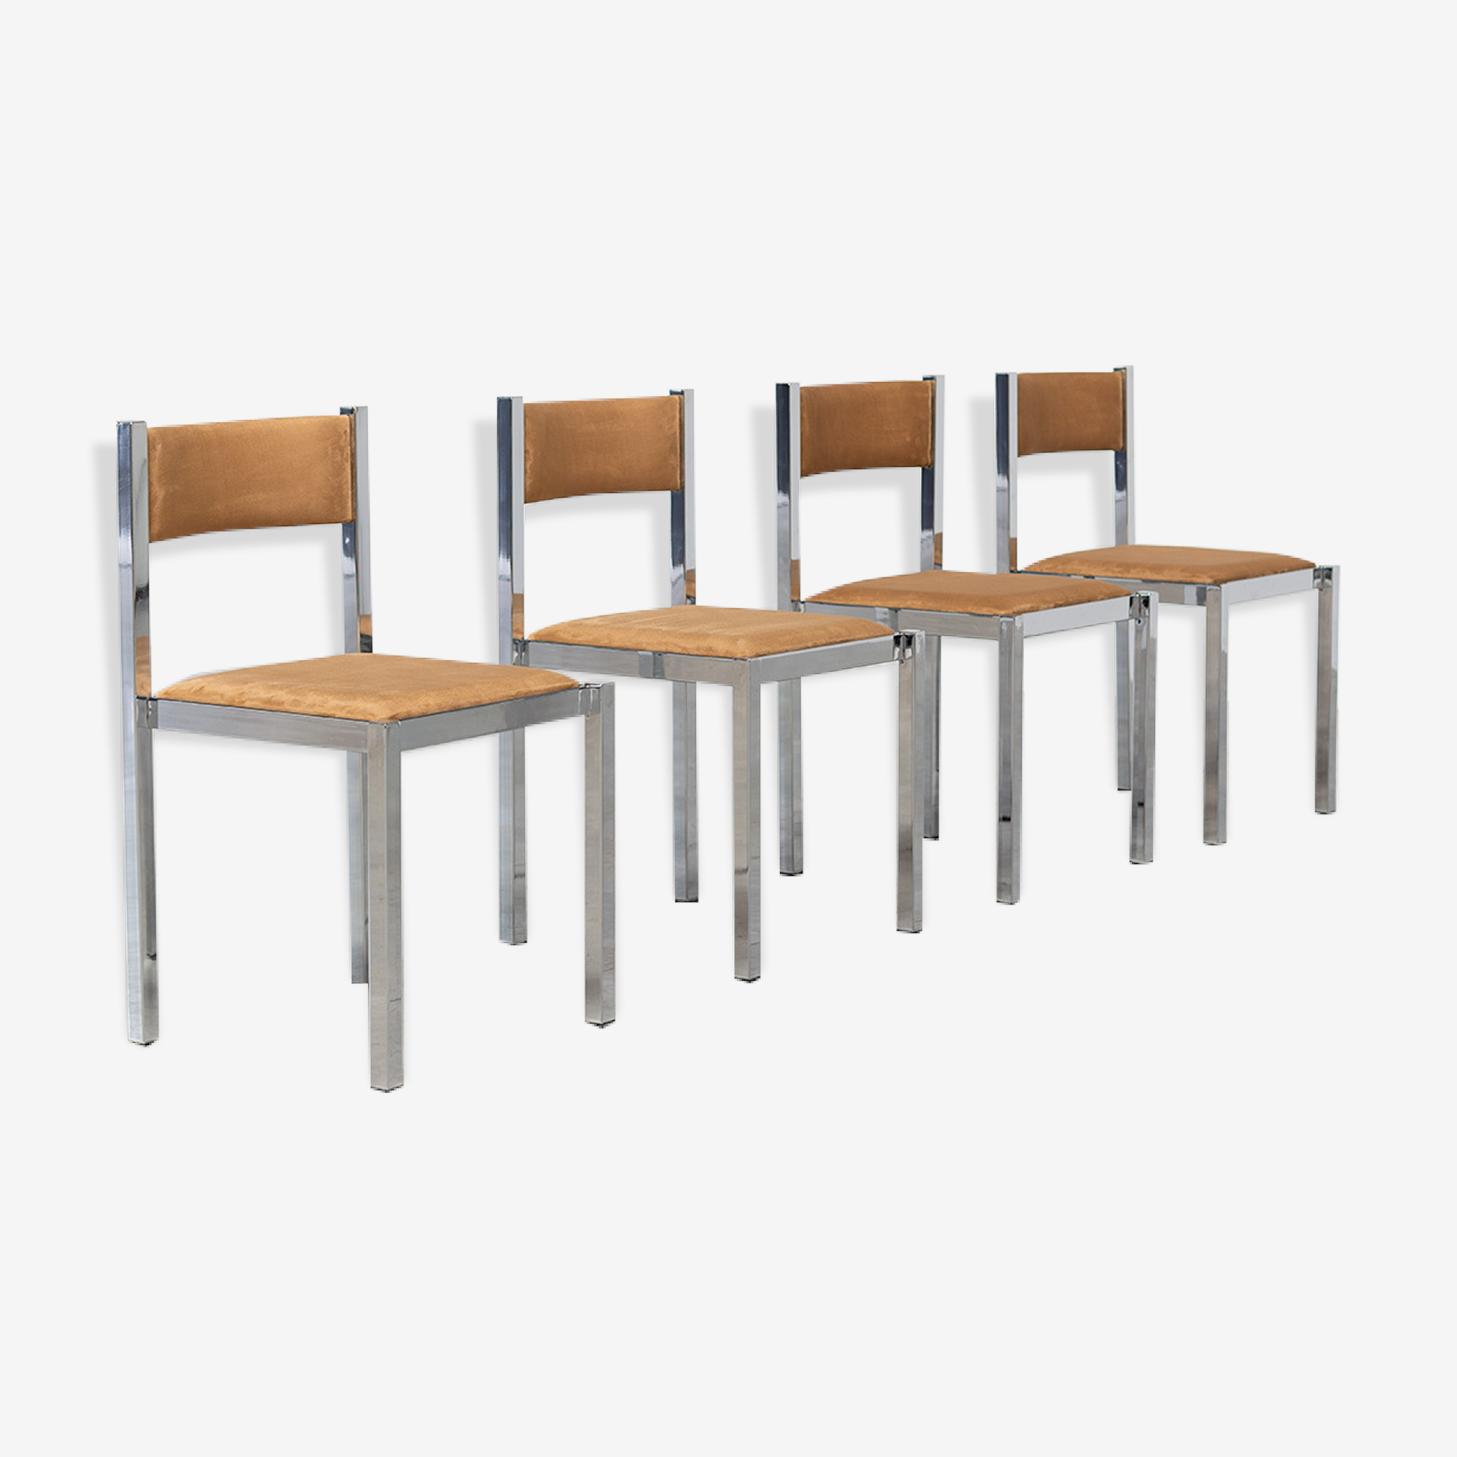 Four chairs chrome Cubist Cidue design Italy 1970